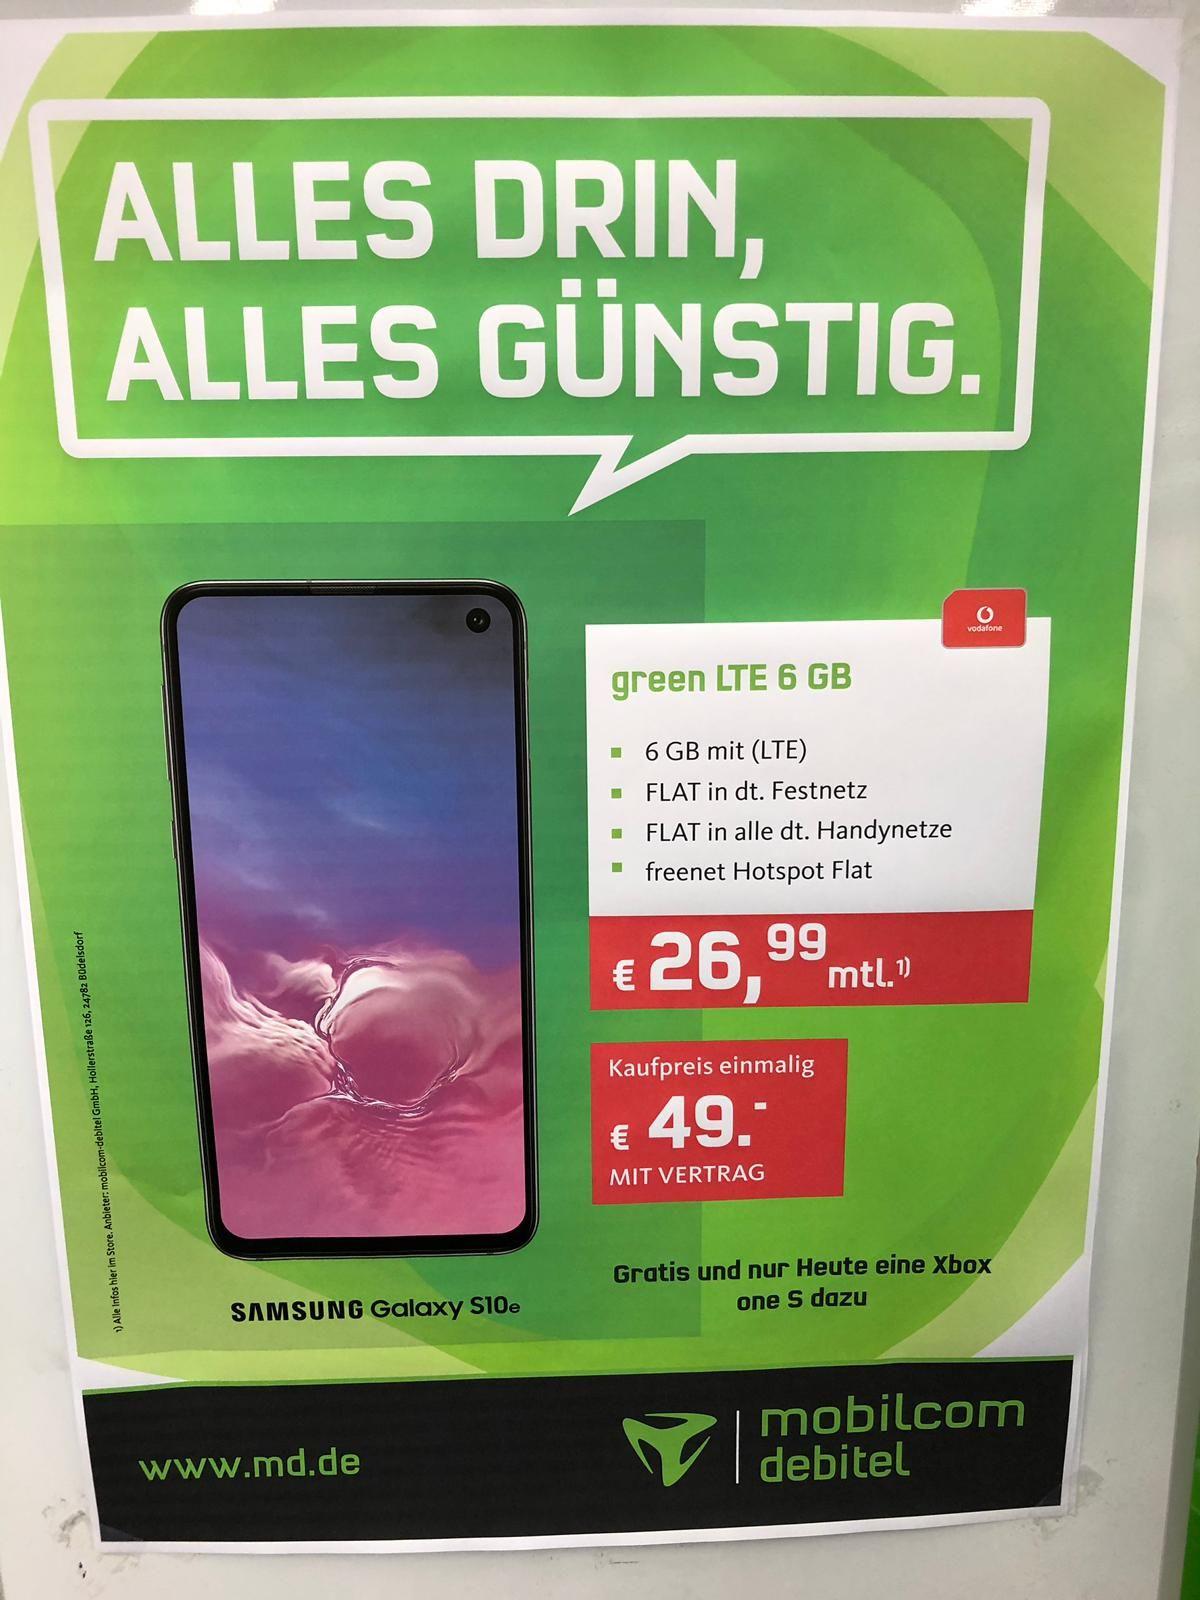 (Lokal) Saturn Hennef Samsung S10e  & Xbox One S mit 6GB LTE  (737,74 €) Mobilfunkvertrag